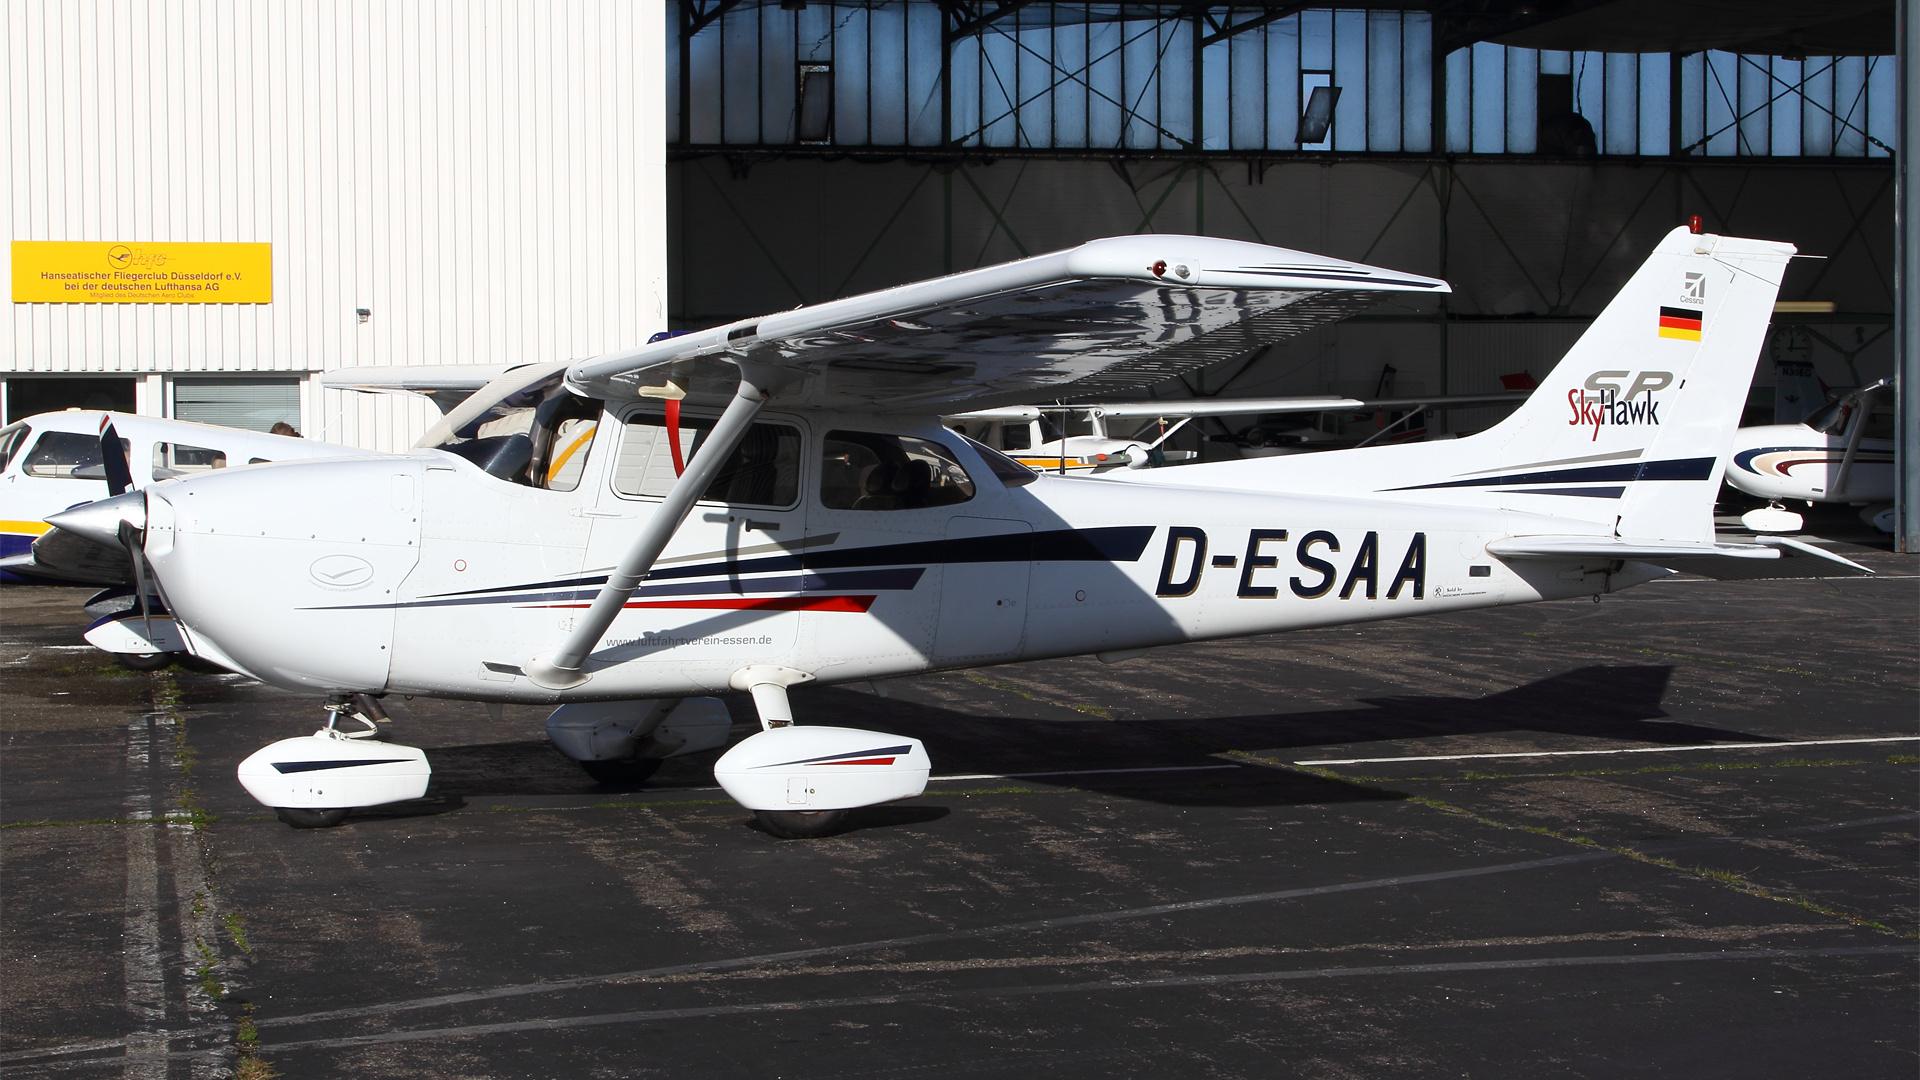 D-ESAA-1 C172 ESS 201411